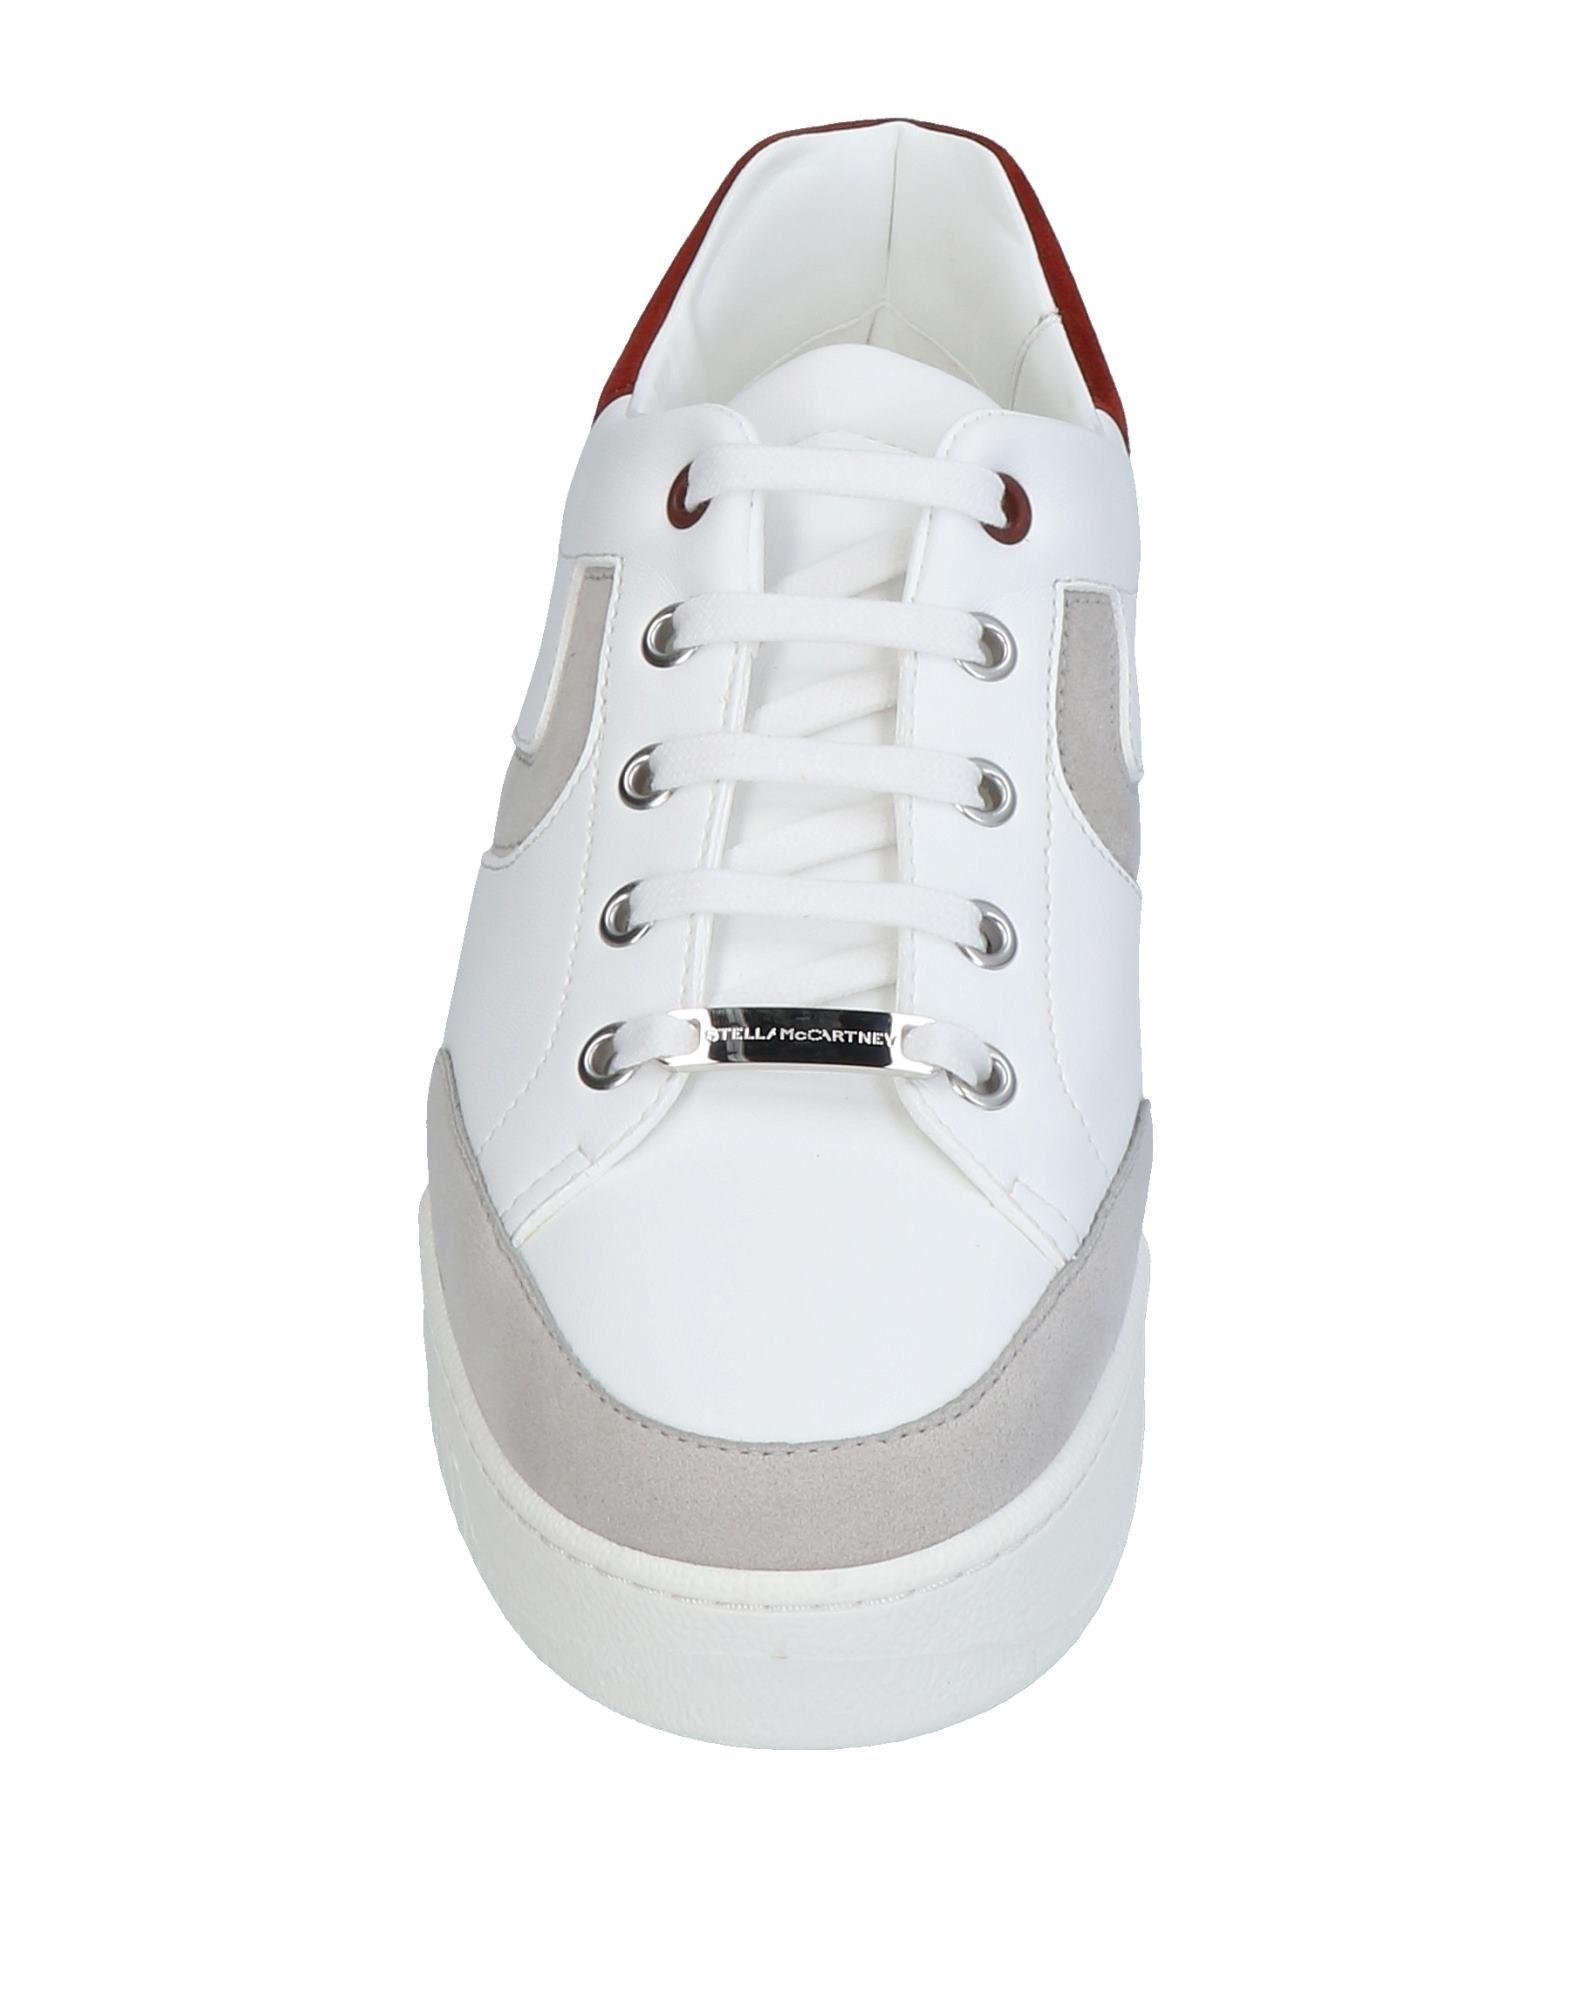 Rabatt Schuhe Stella Damen Mccartney Sneakers Damen Stella  11460293LL 9e9a41